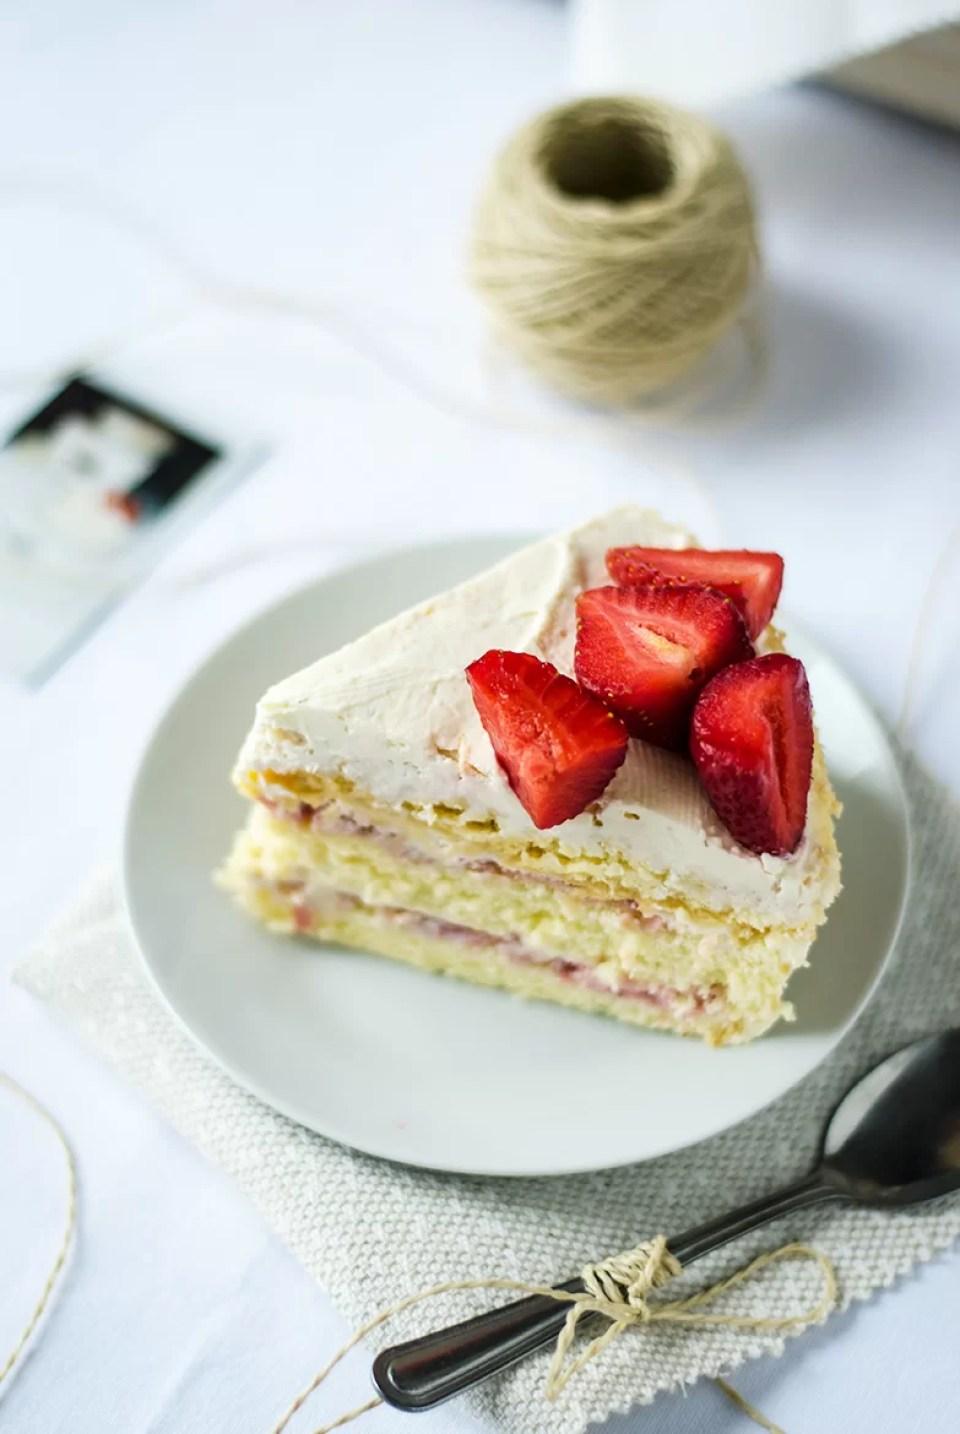 tort z truskawkami jak zrobić